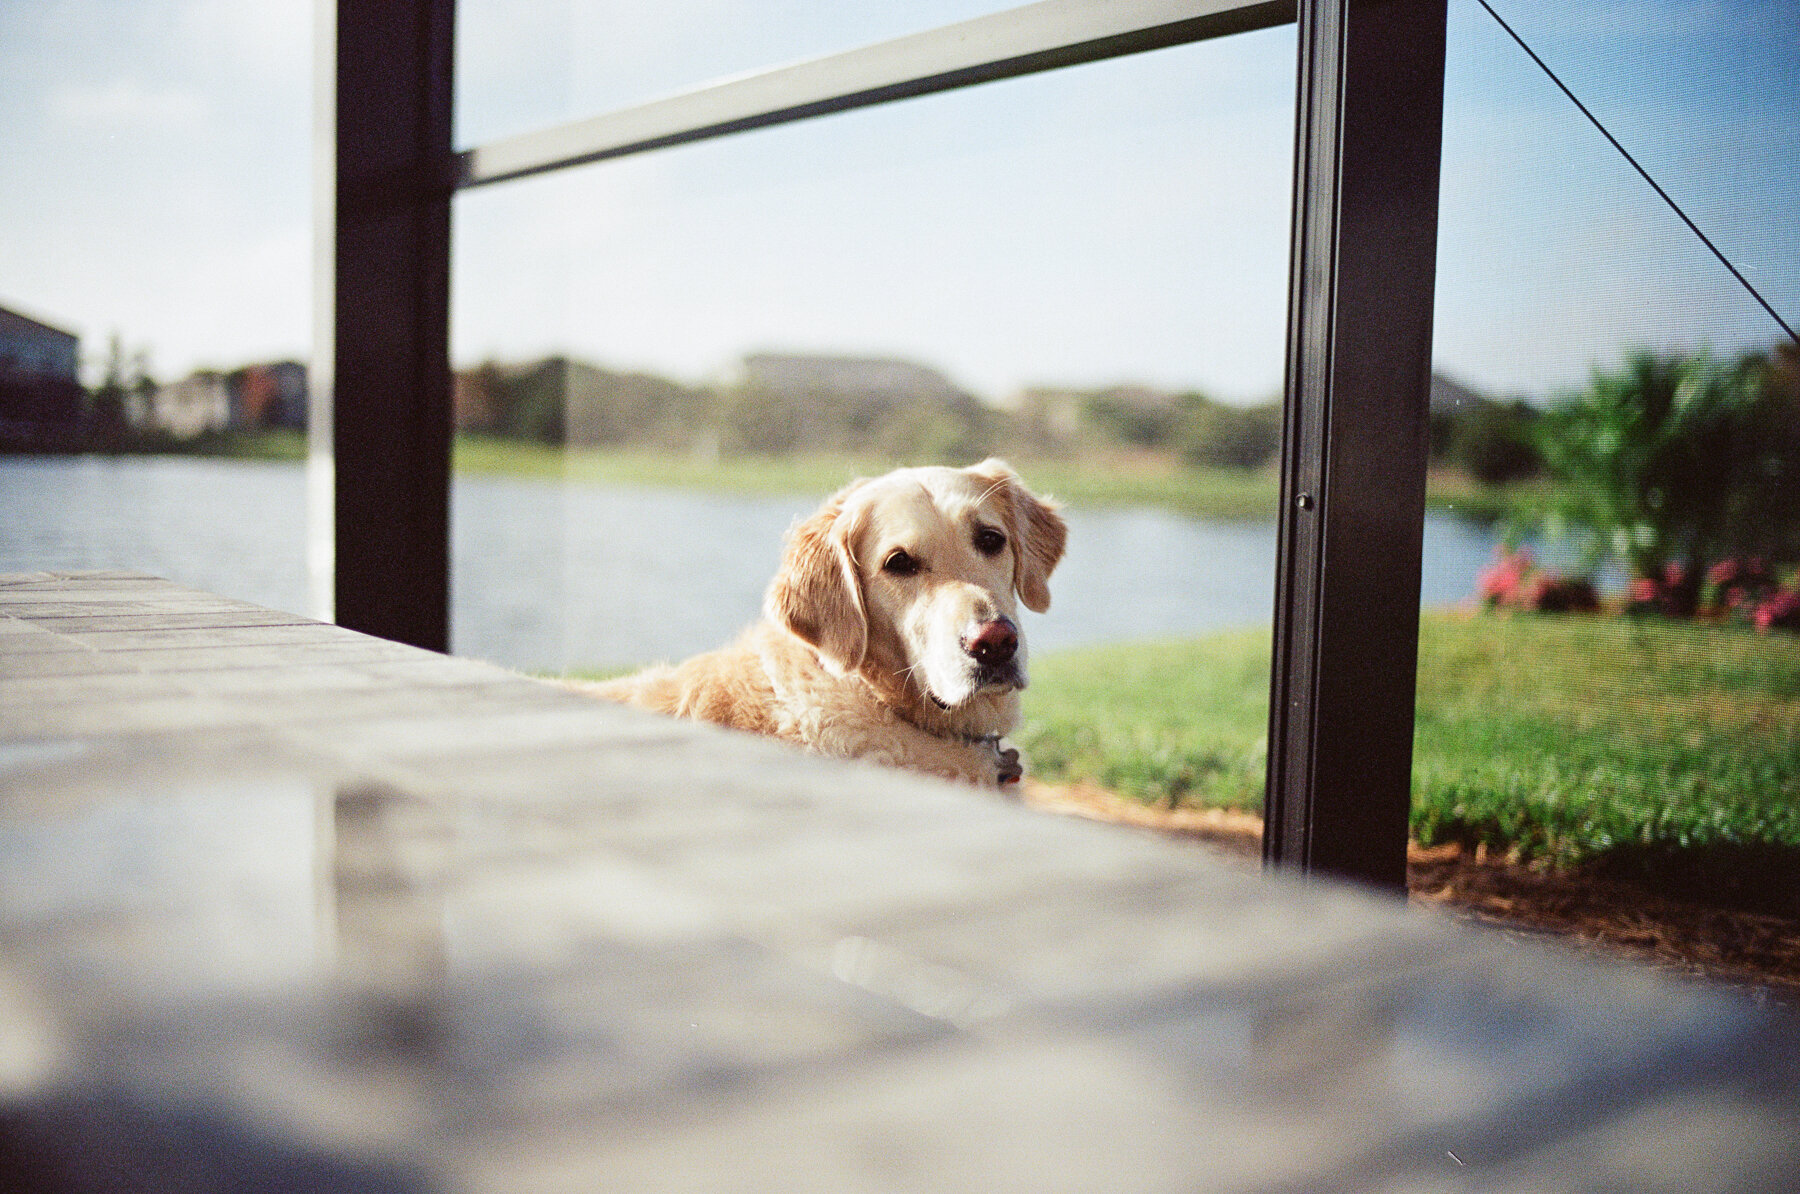 Leica-M6-Pool-Chloe-8.jpg